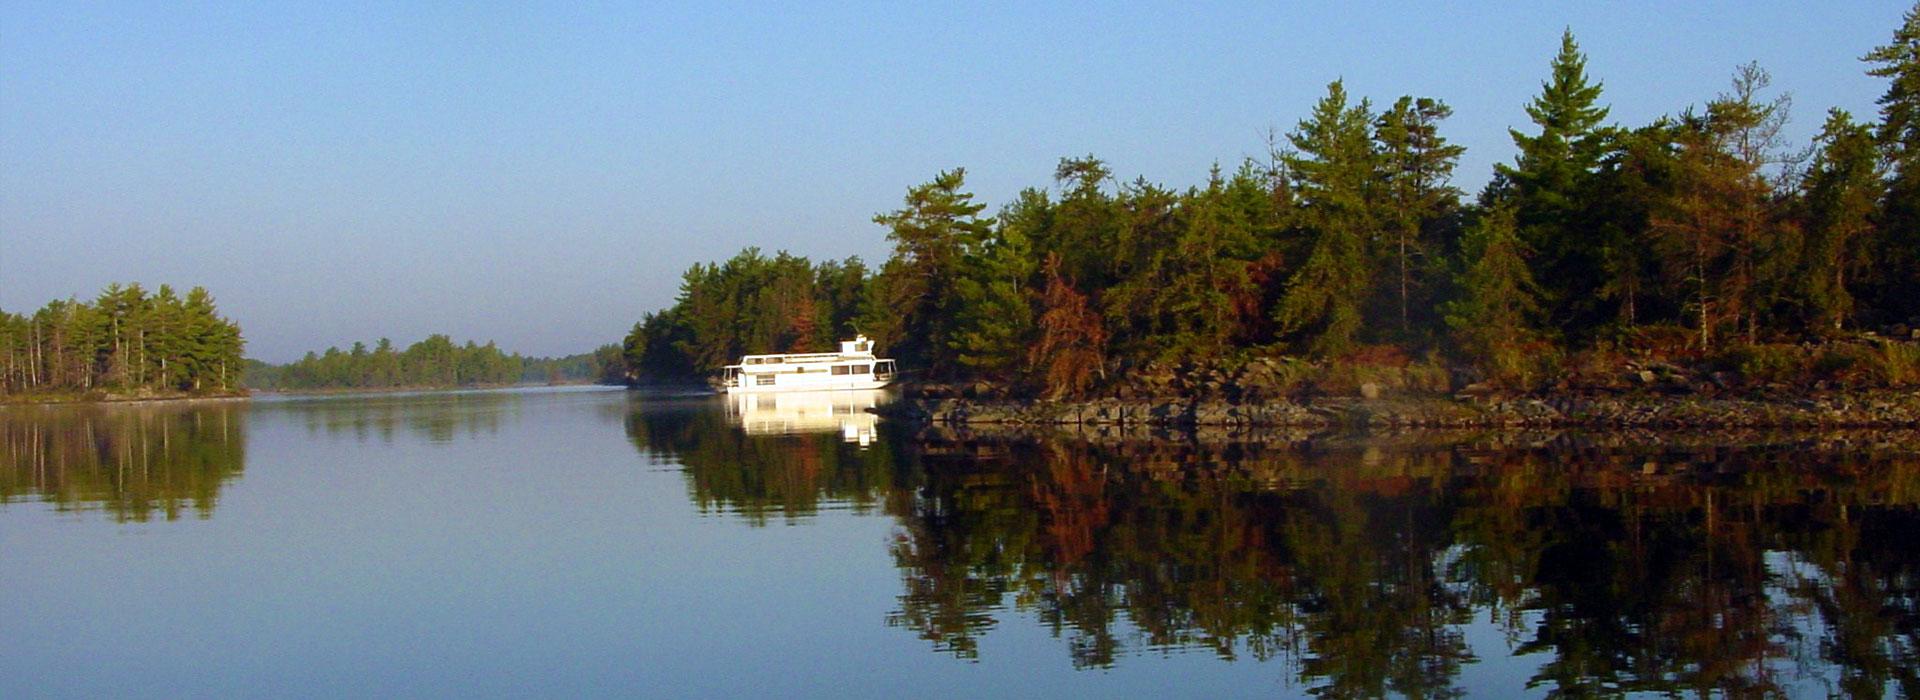 Fishing lodges in minnesota for Rainy lake fishing